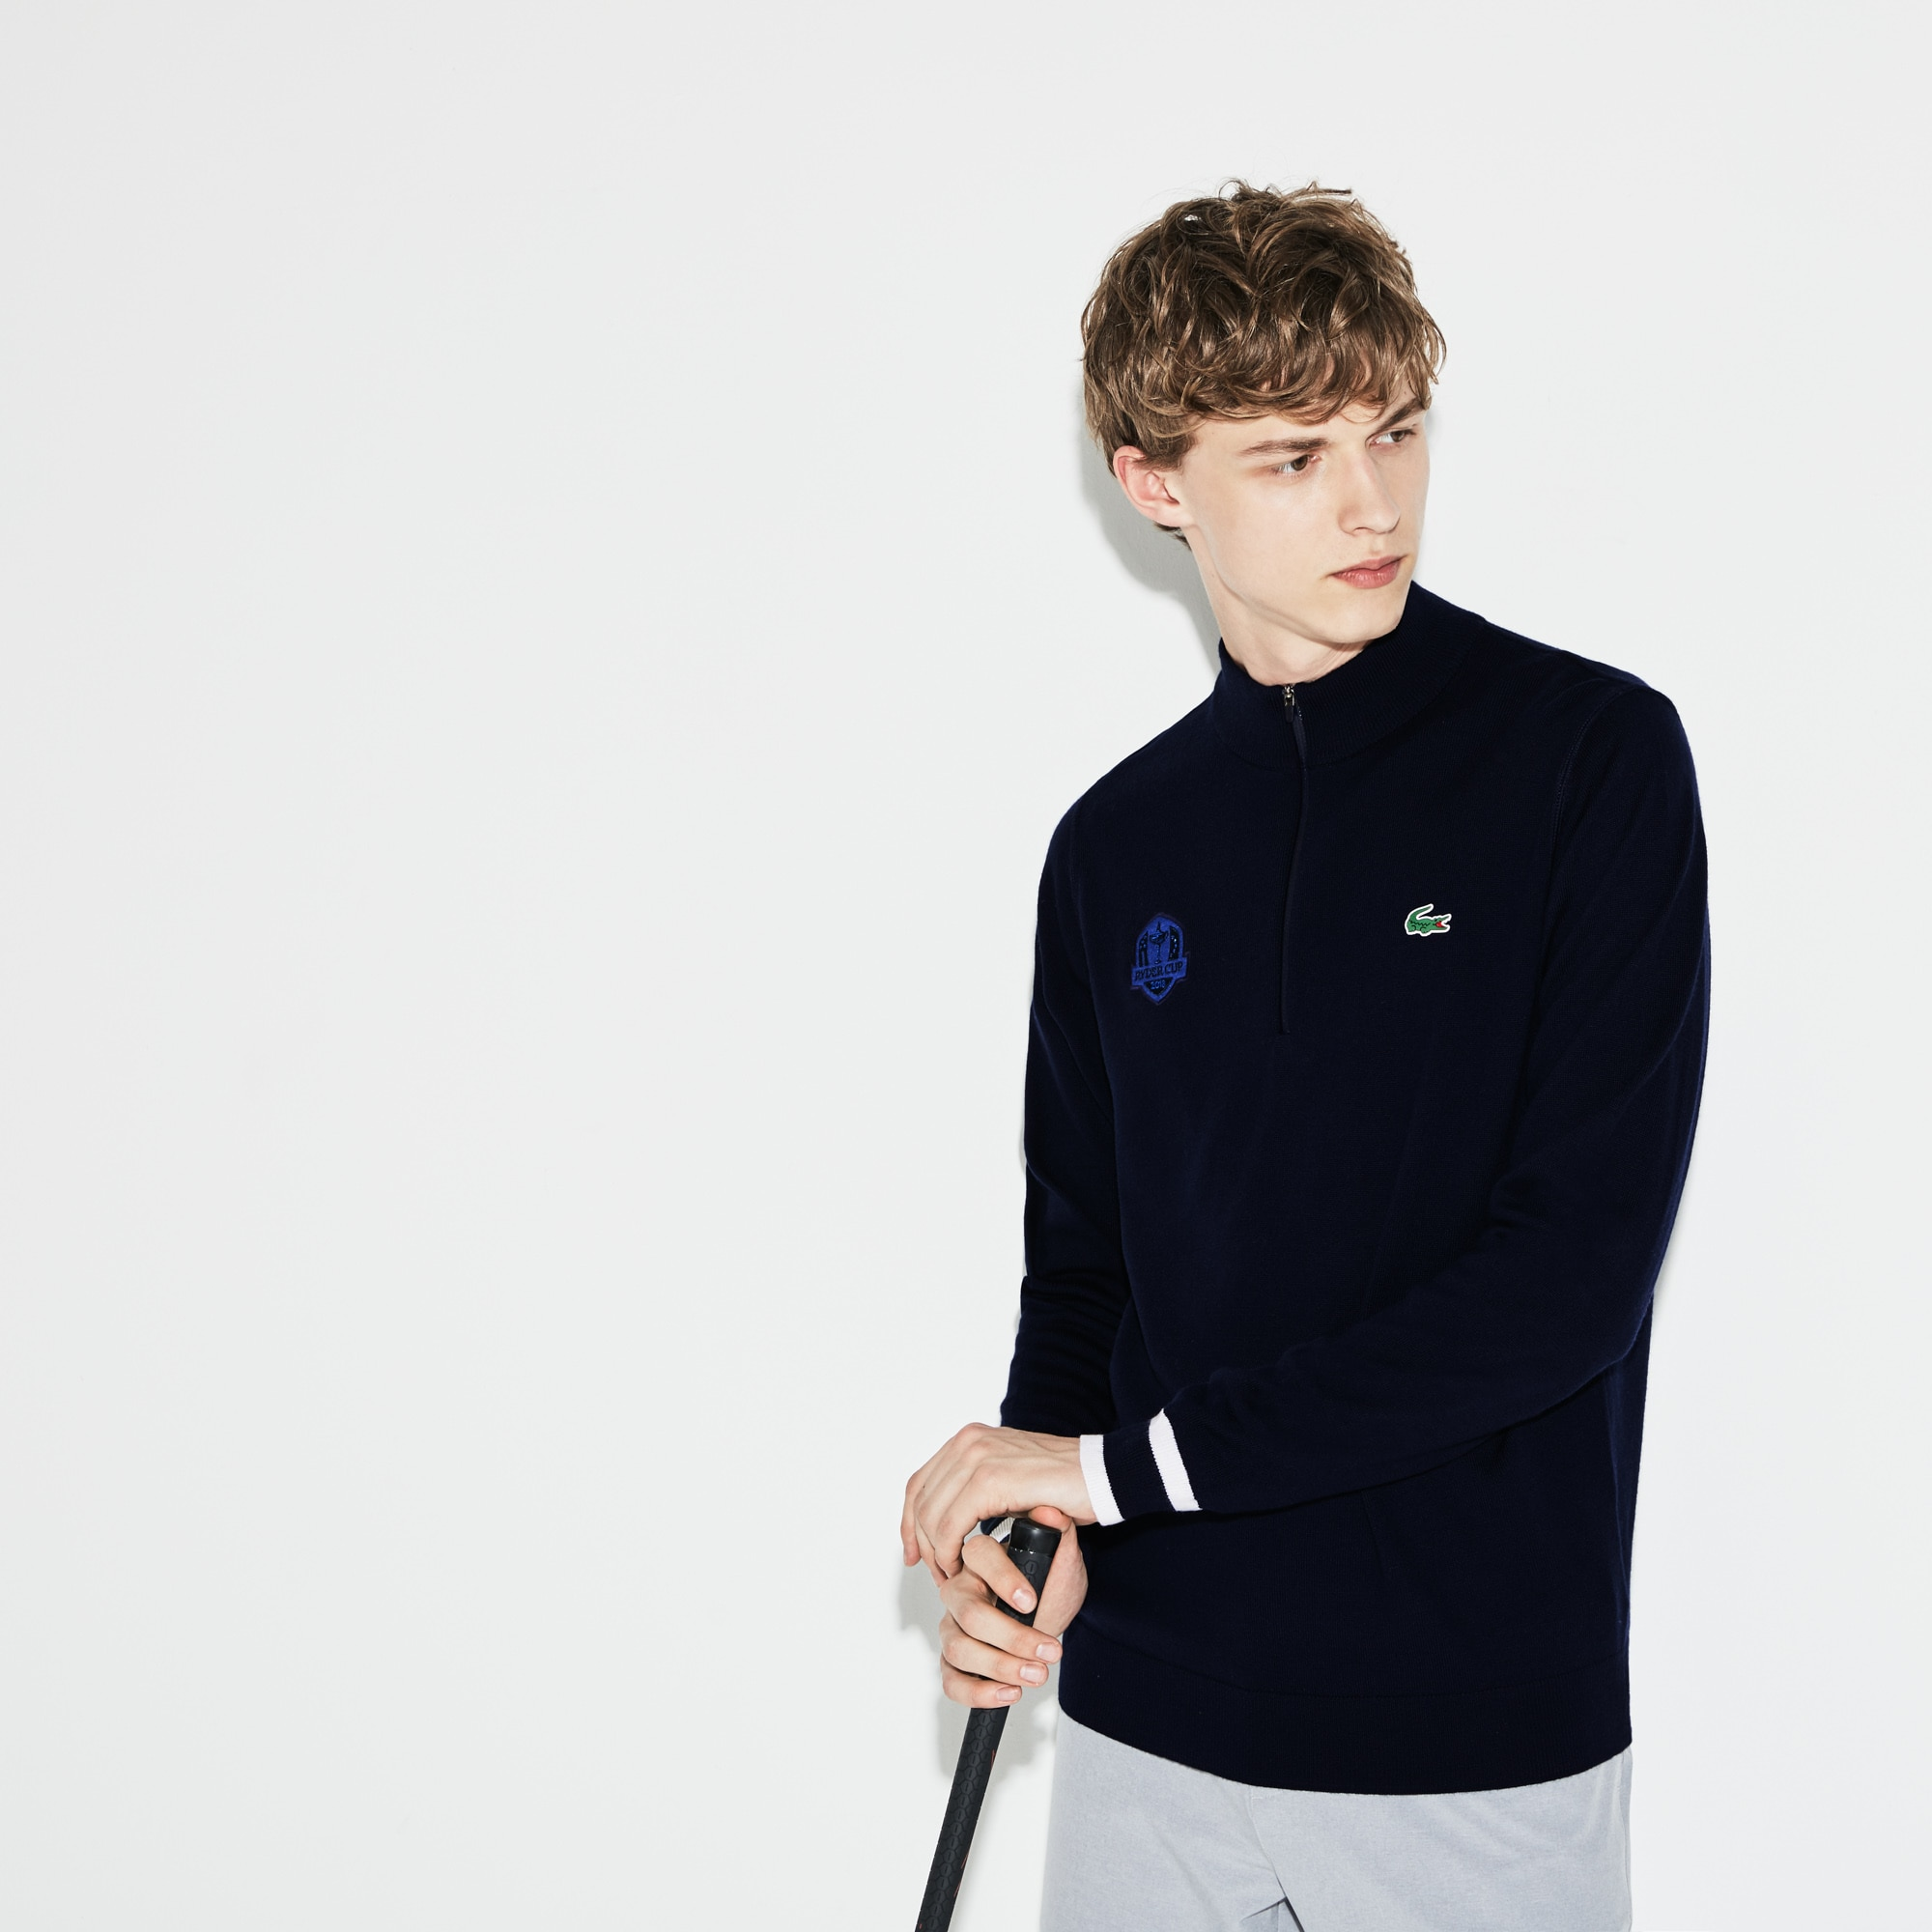 Herren LACOSTE SPORT Ryder Cup Edition Golf Pullover aus Jersey